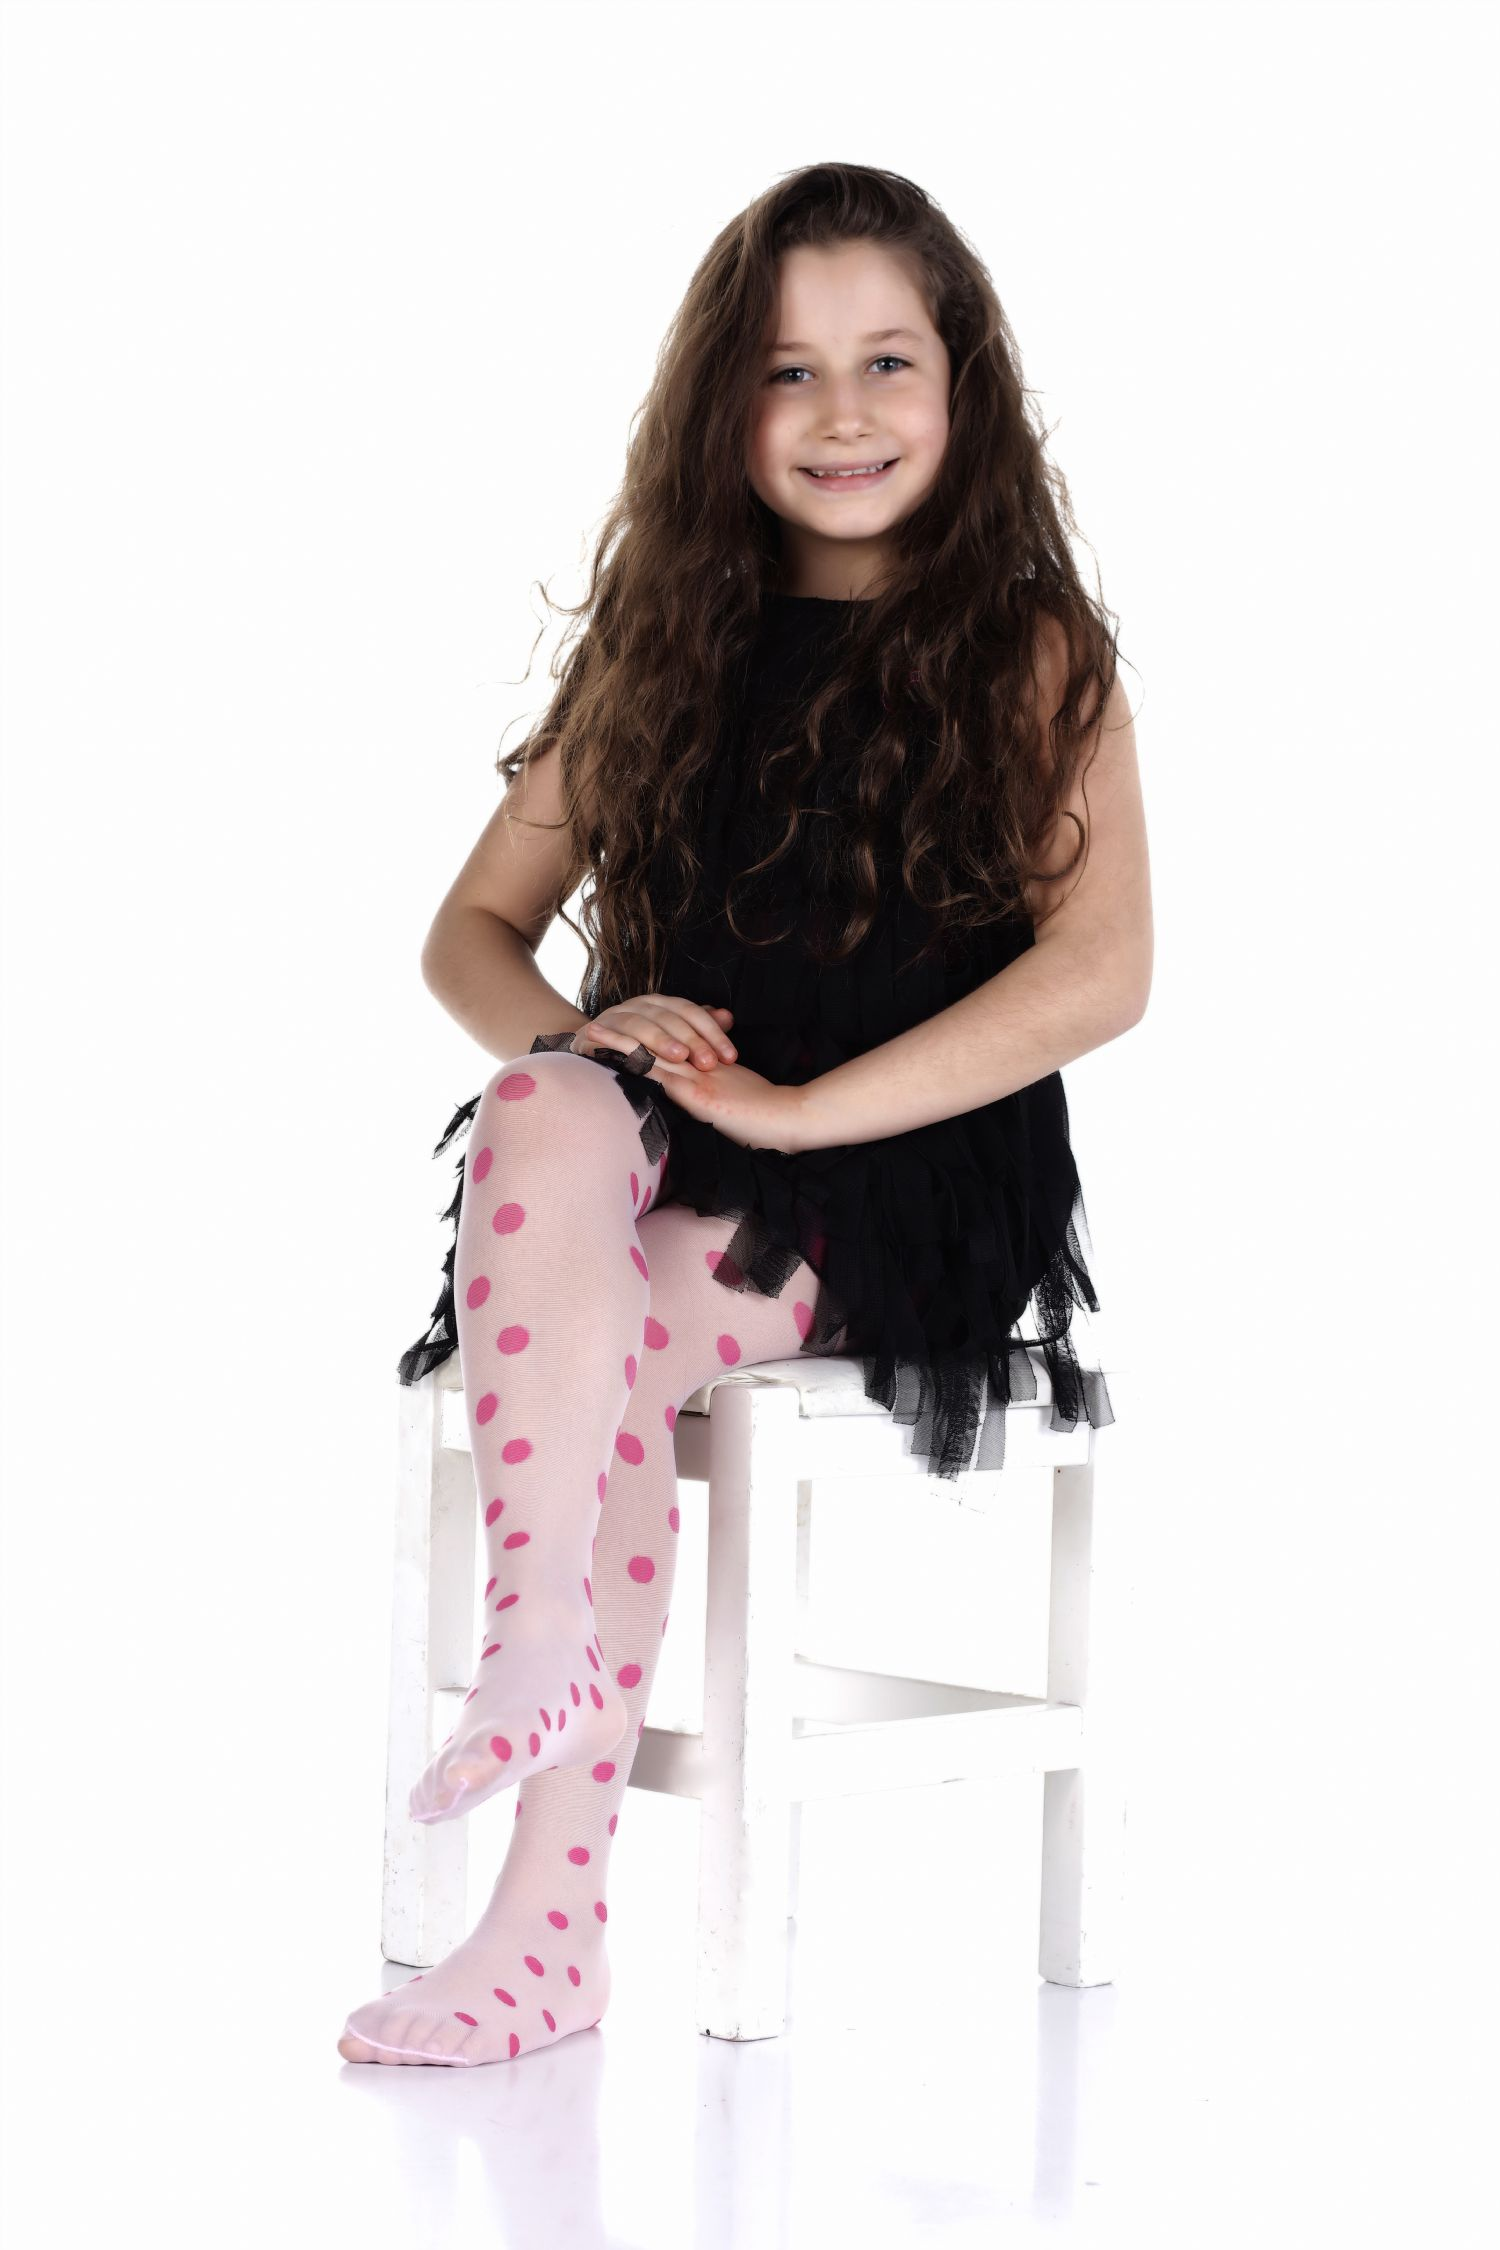 20 den kinder strumpfhosen m dchen elite style stocking. Black Bedroom Furniture Sets. Home Design Ideas